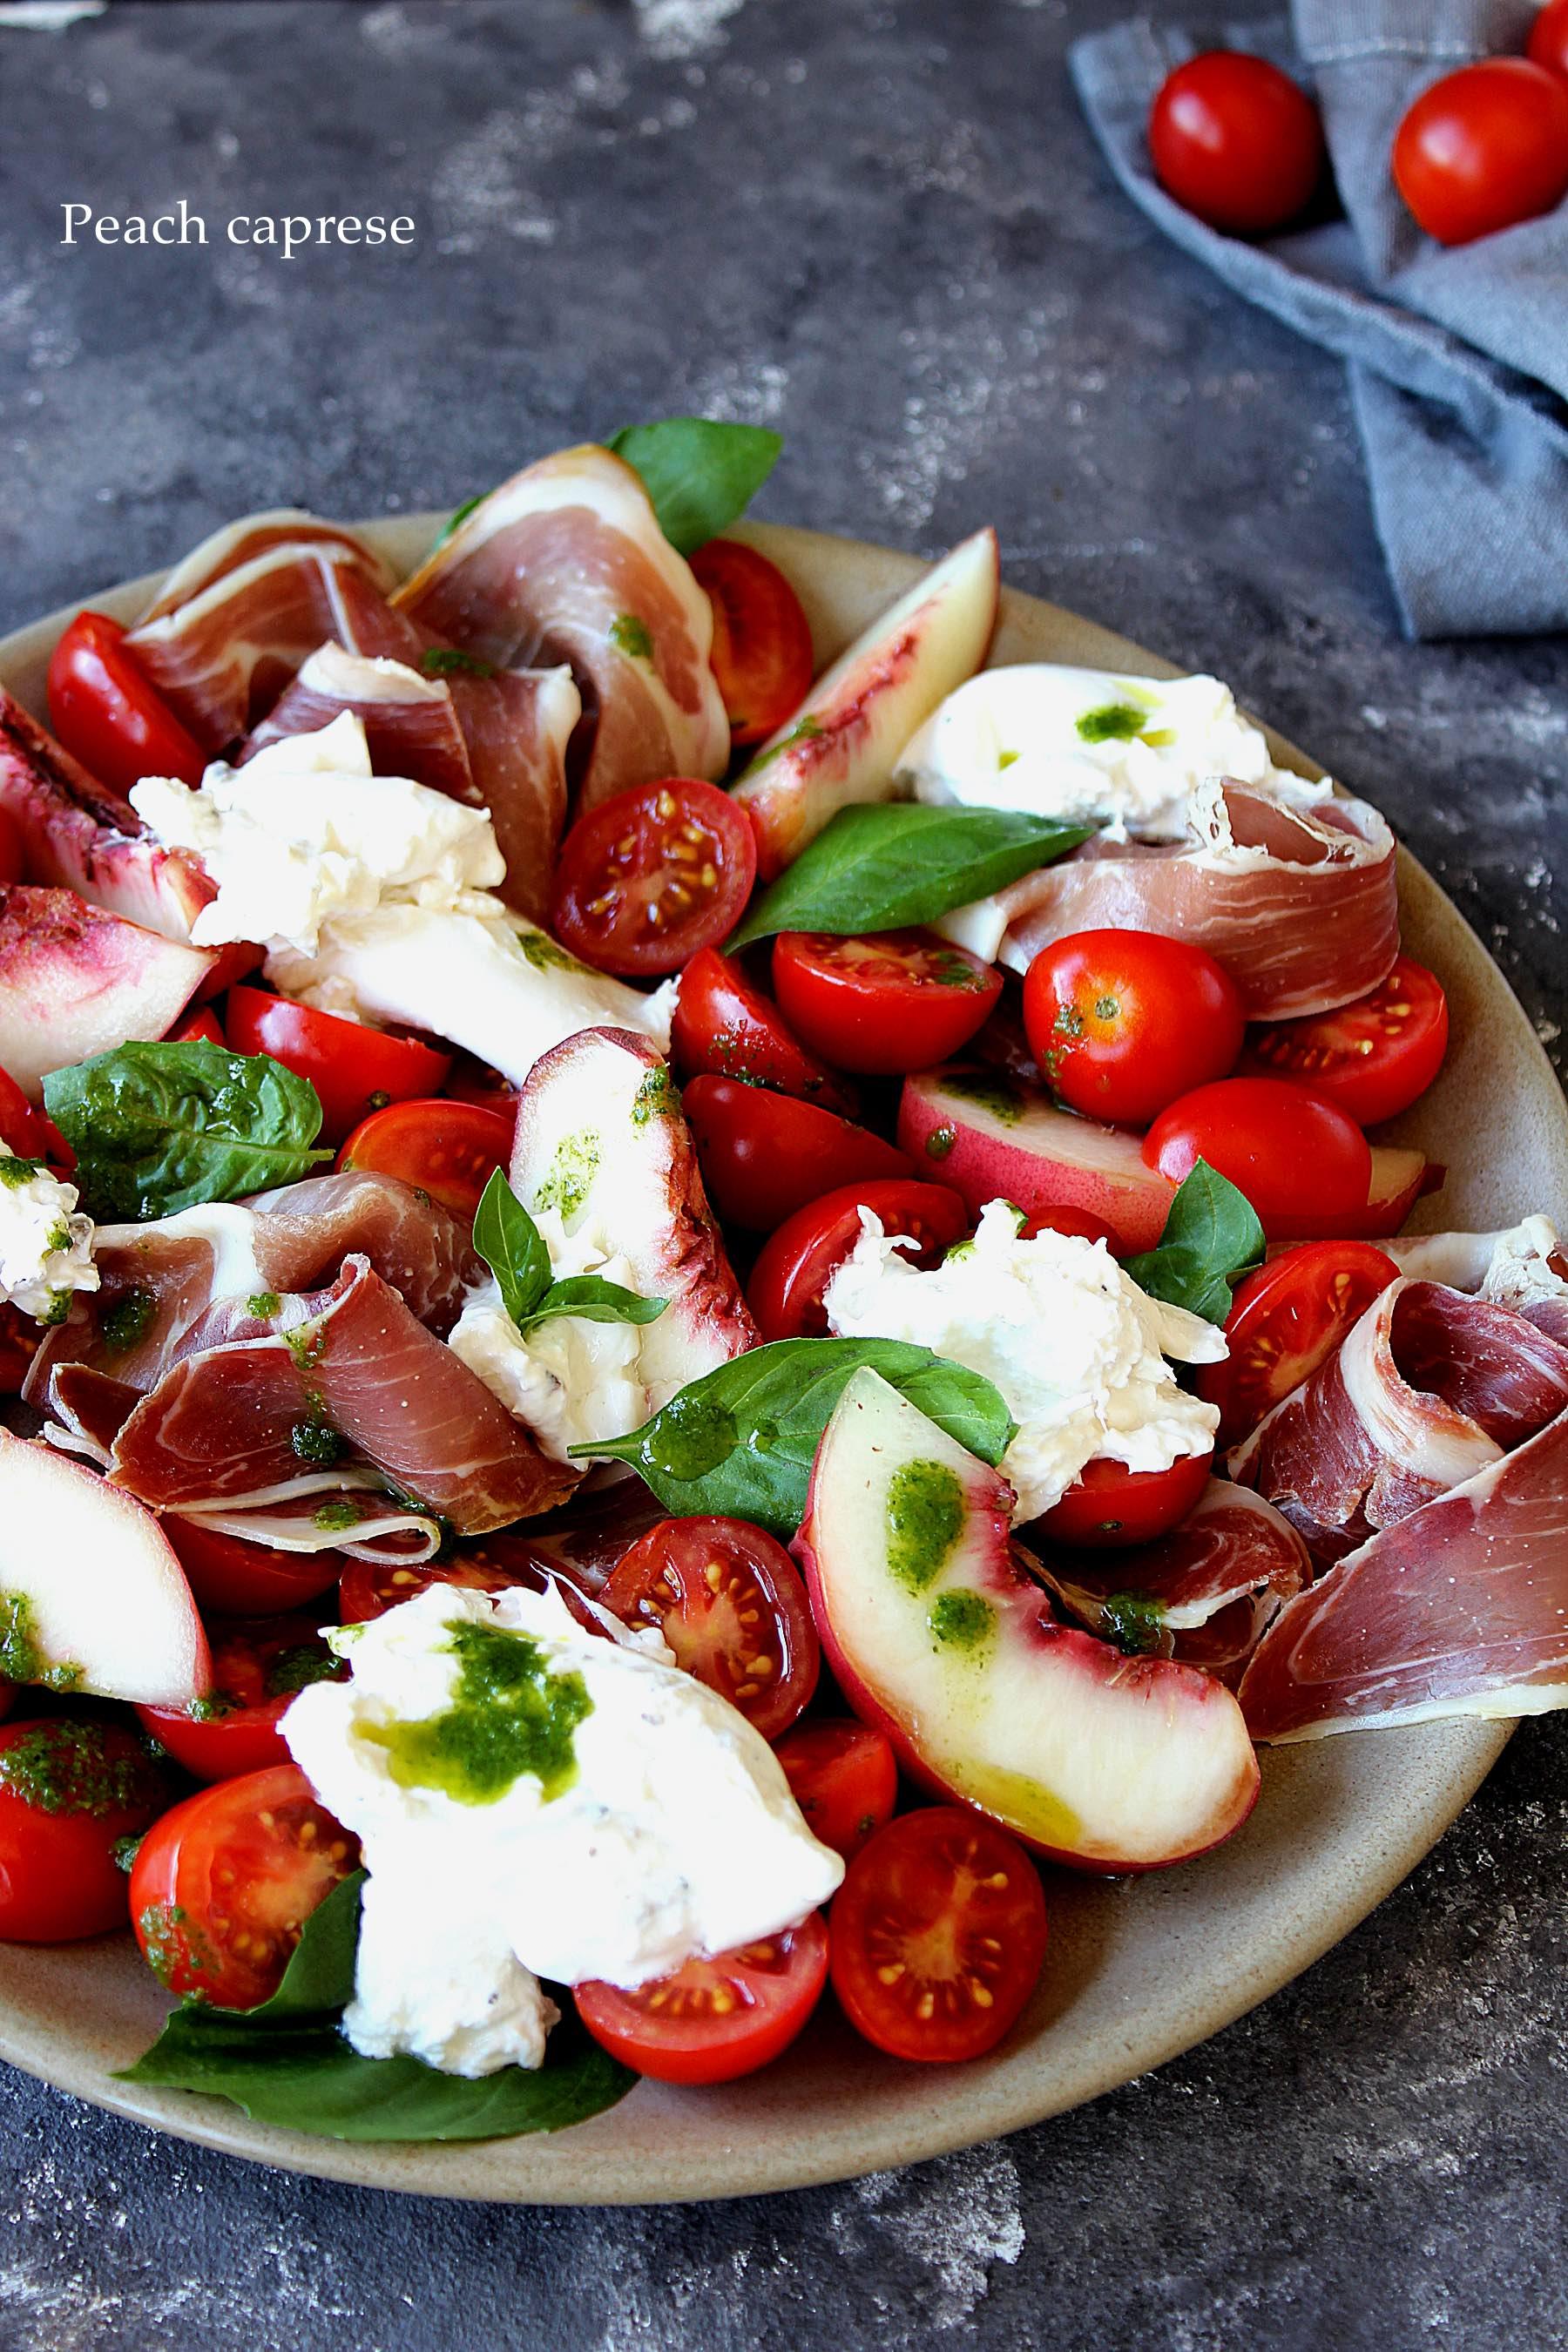 Salade caprese gourmande aux pêches